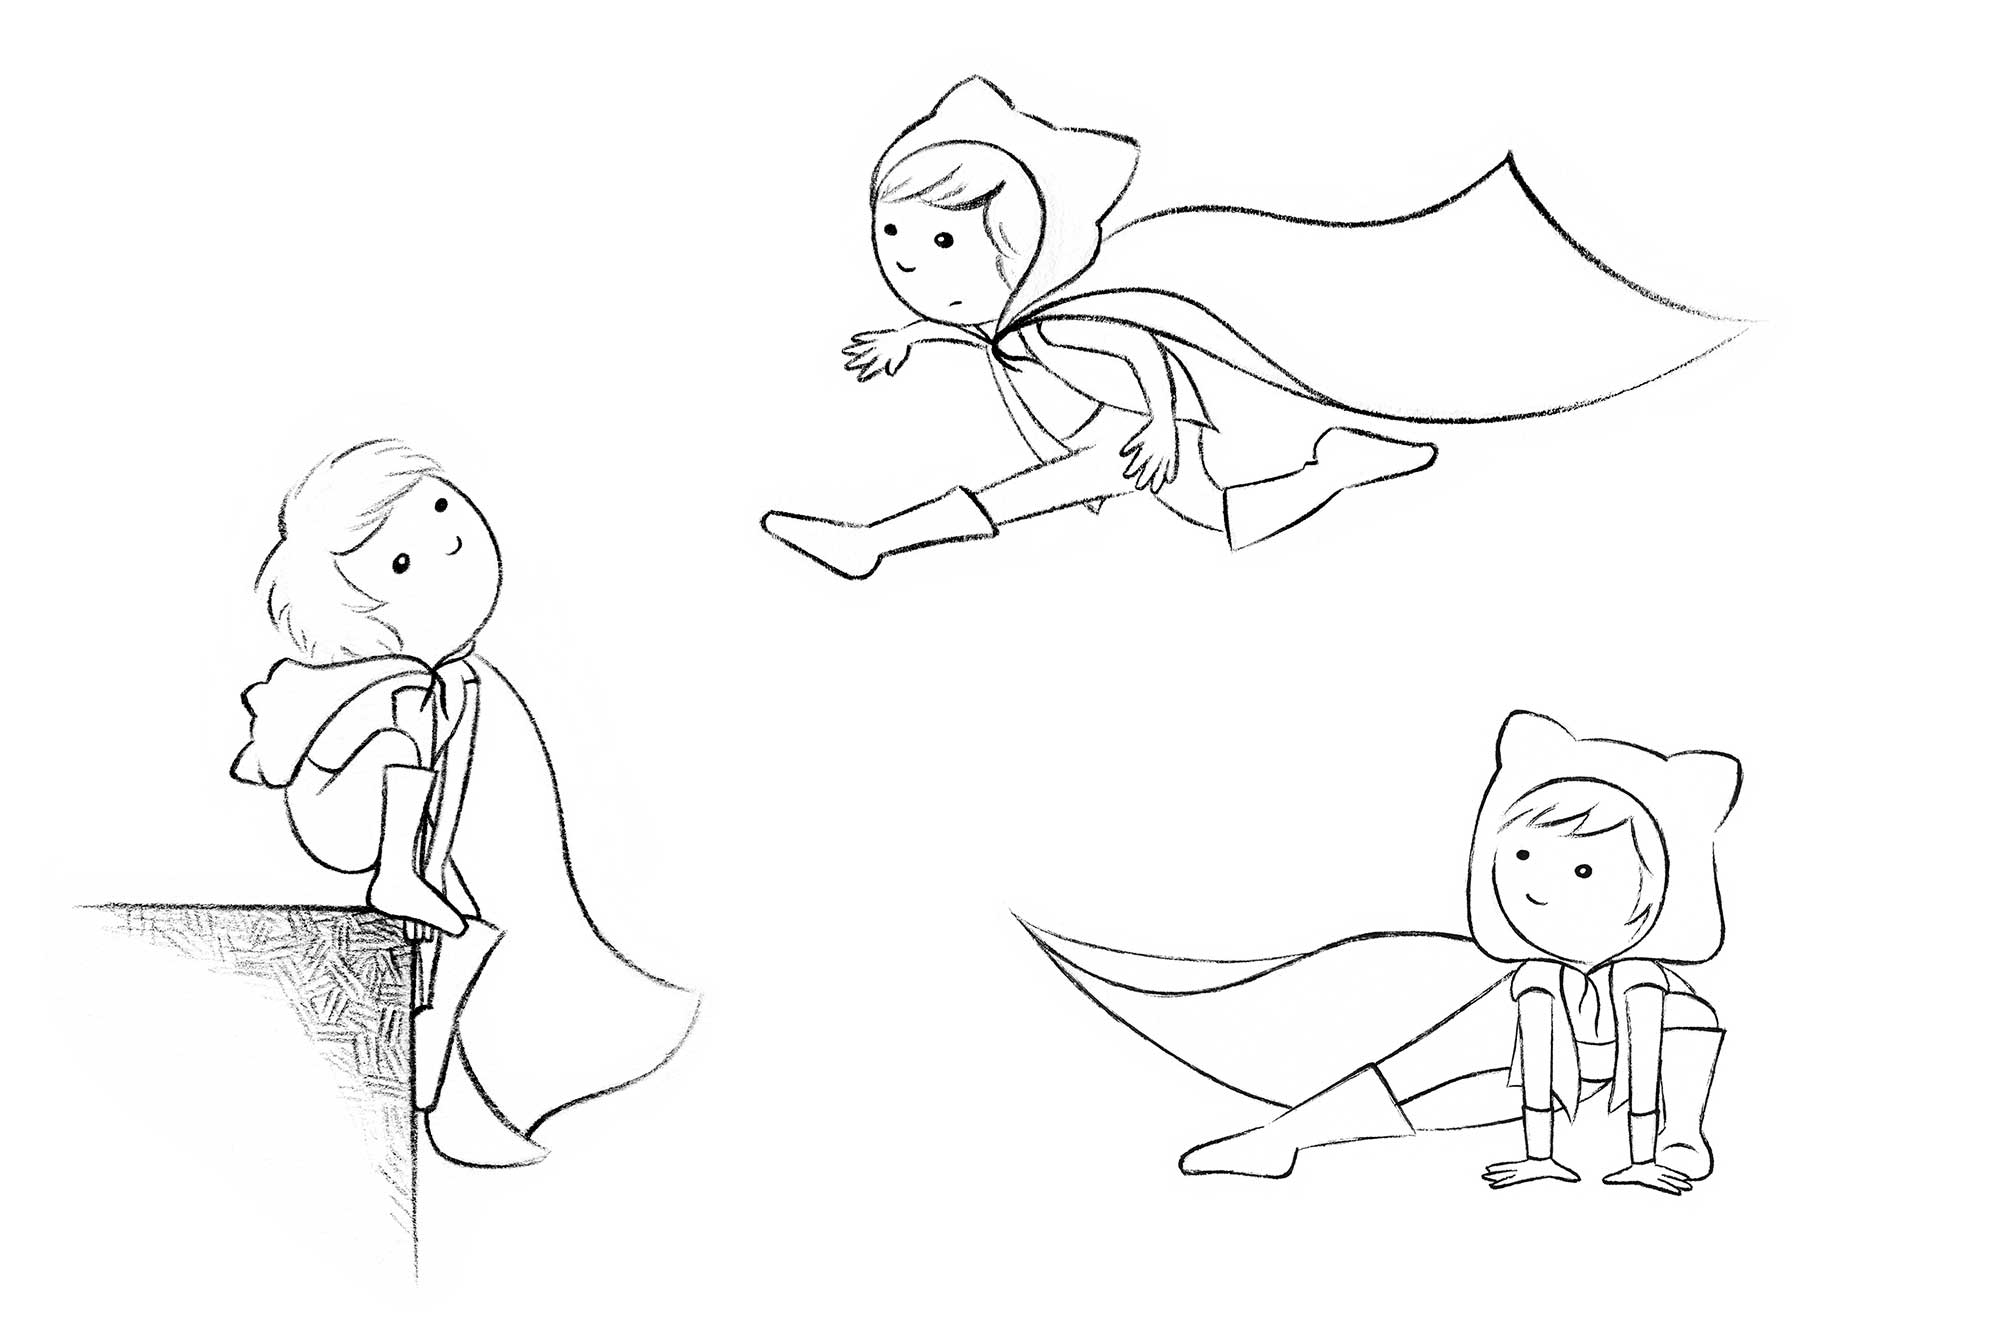 LR-Sketch1.jpg